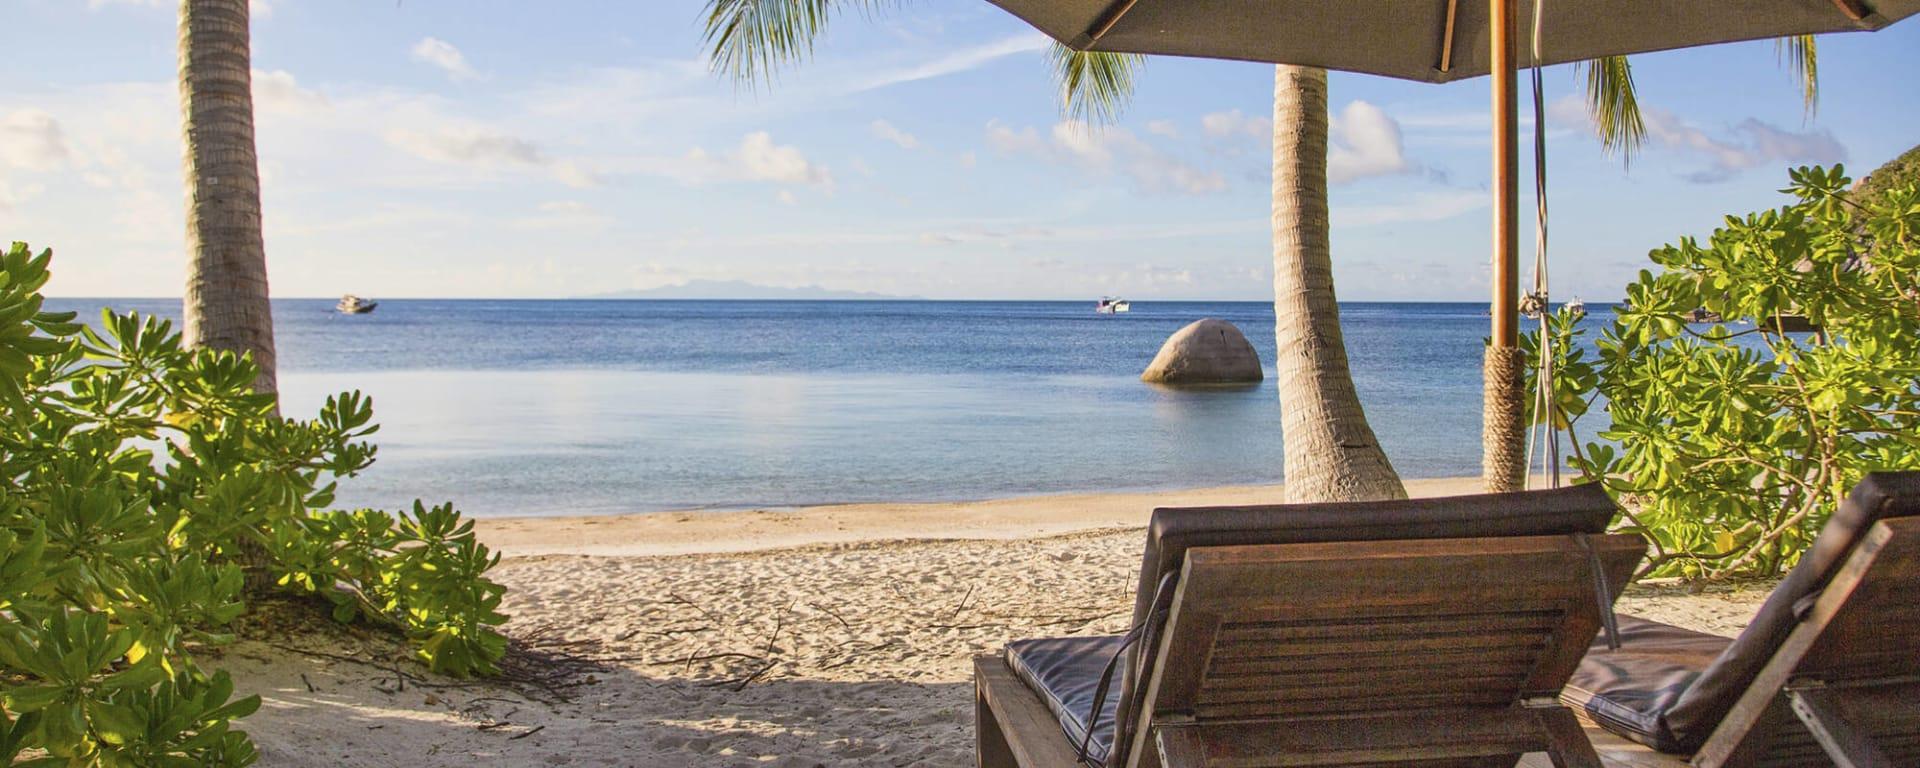 The Haad Tien Beach Resort in Ko Tao: Thailand The Haadtien Beach Resort Strand